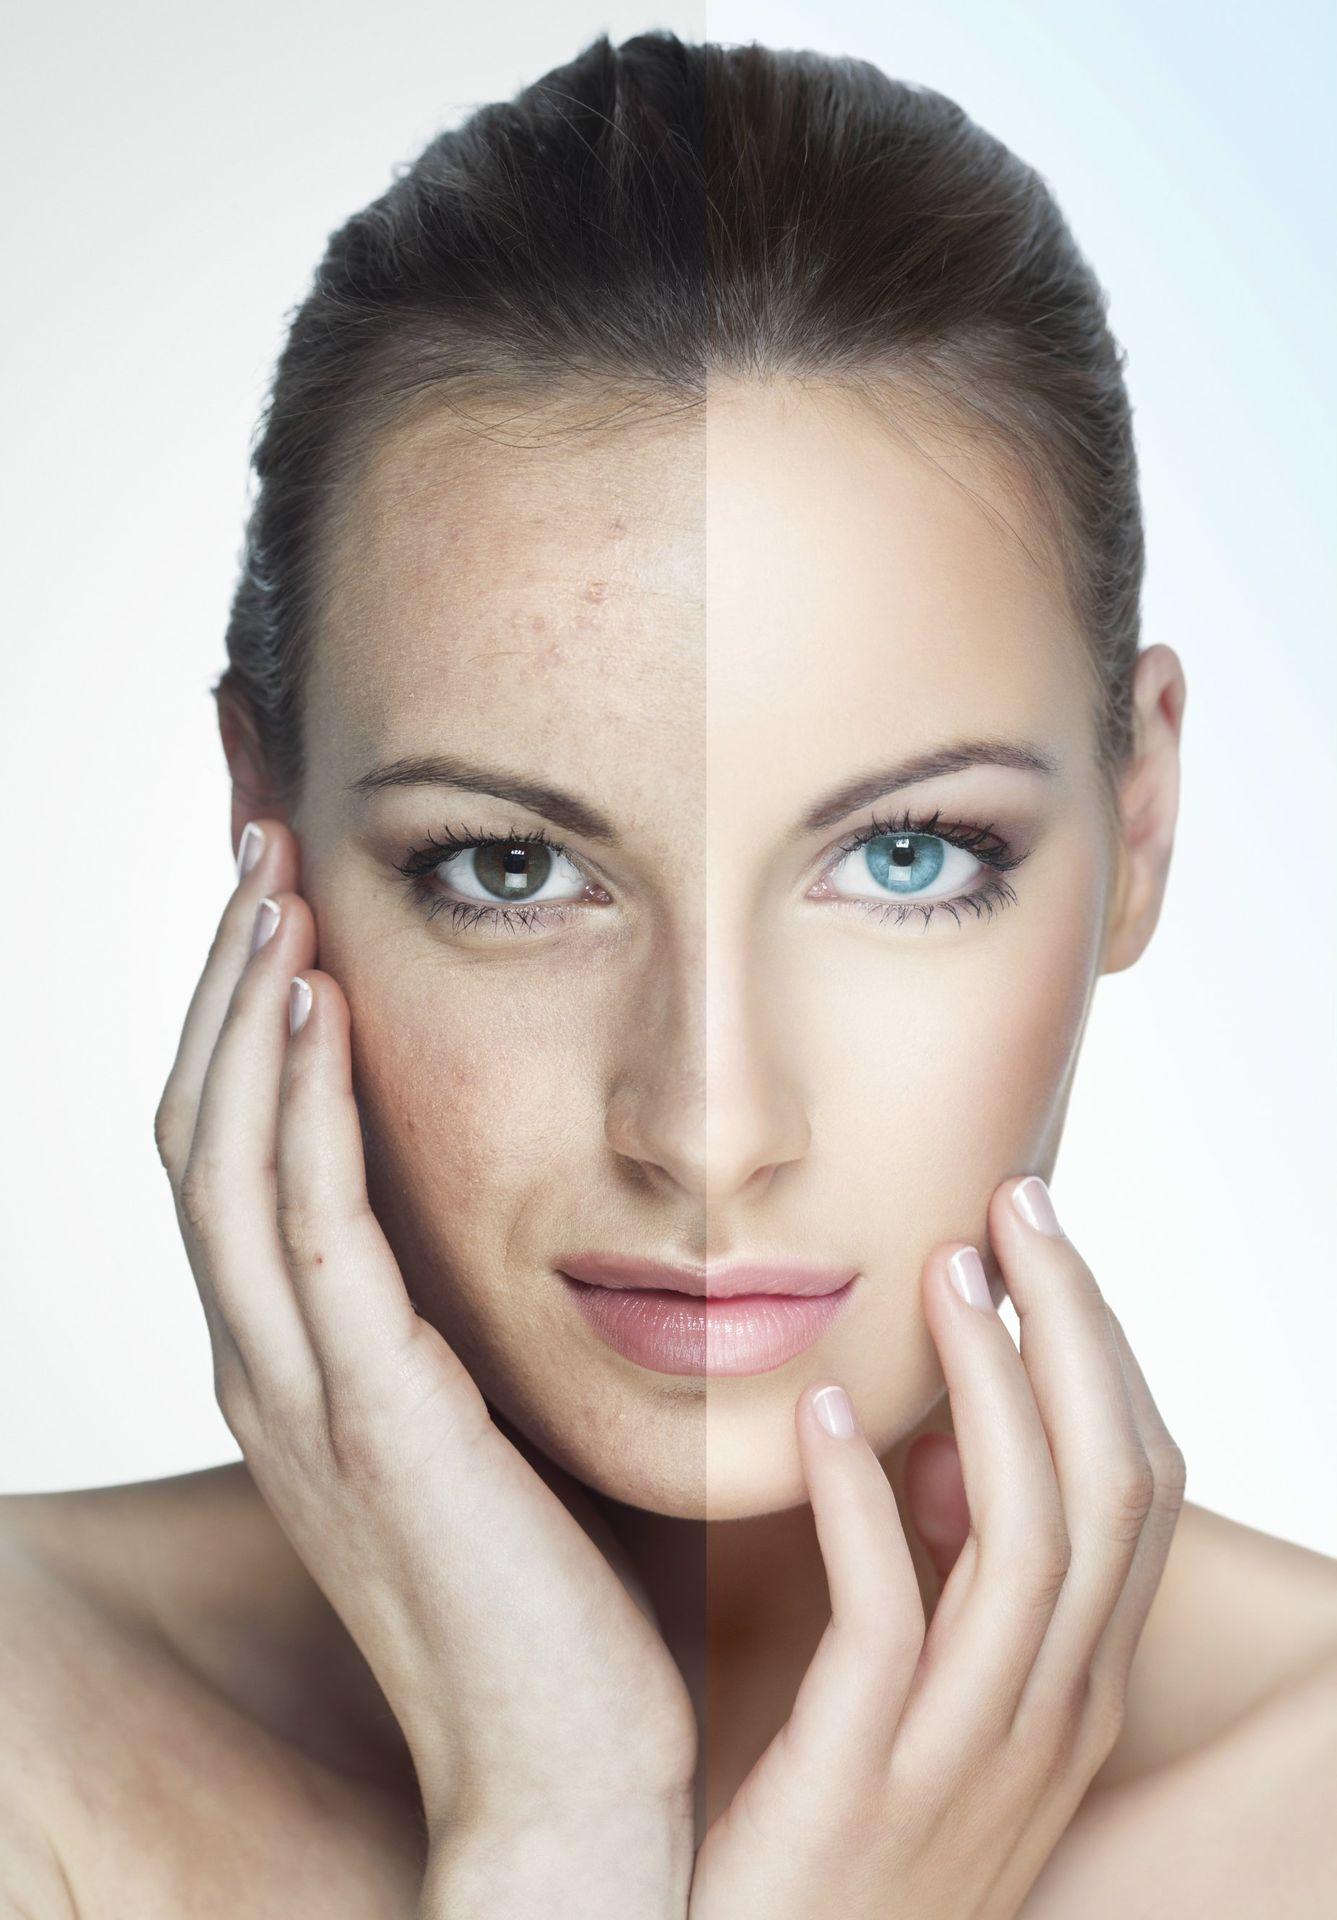 skin-care-istock_000019210111large-care